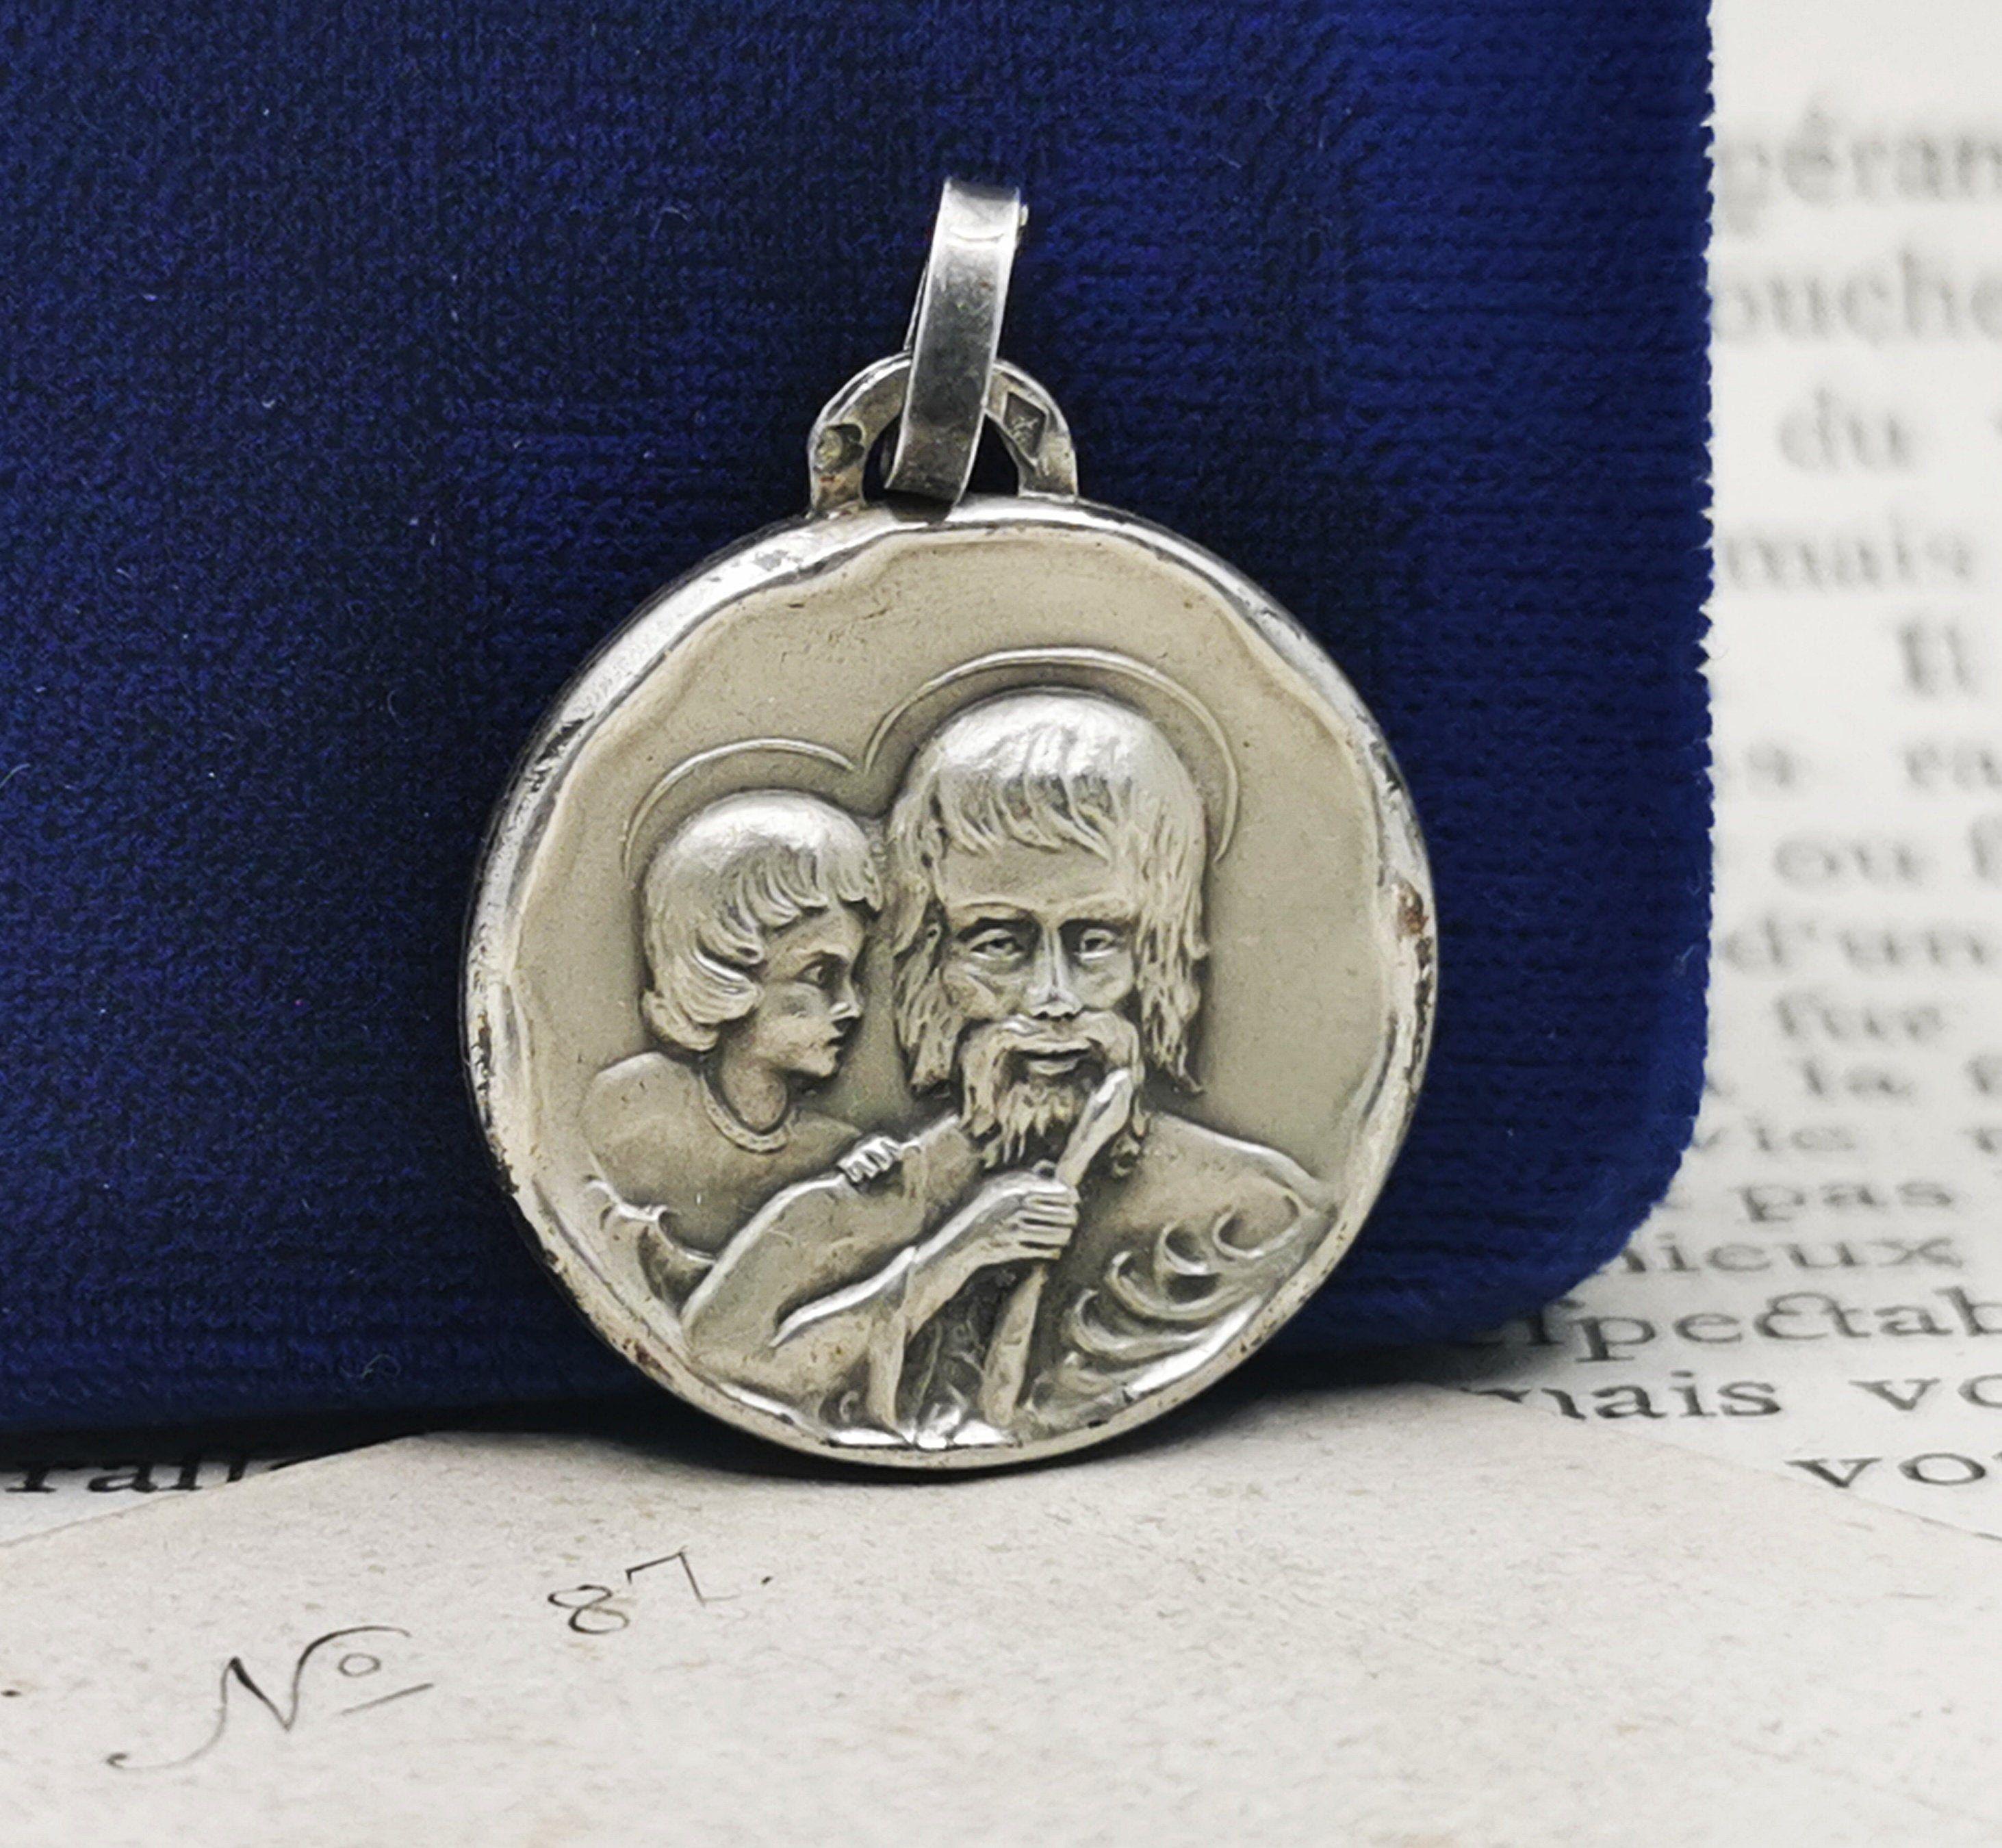 Solid 925 Sterling Silver Vintage Antiqued Catholic Patron Saint Luke Pendant Charm Medal 26mm x 20mm